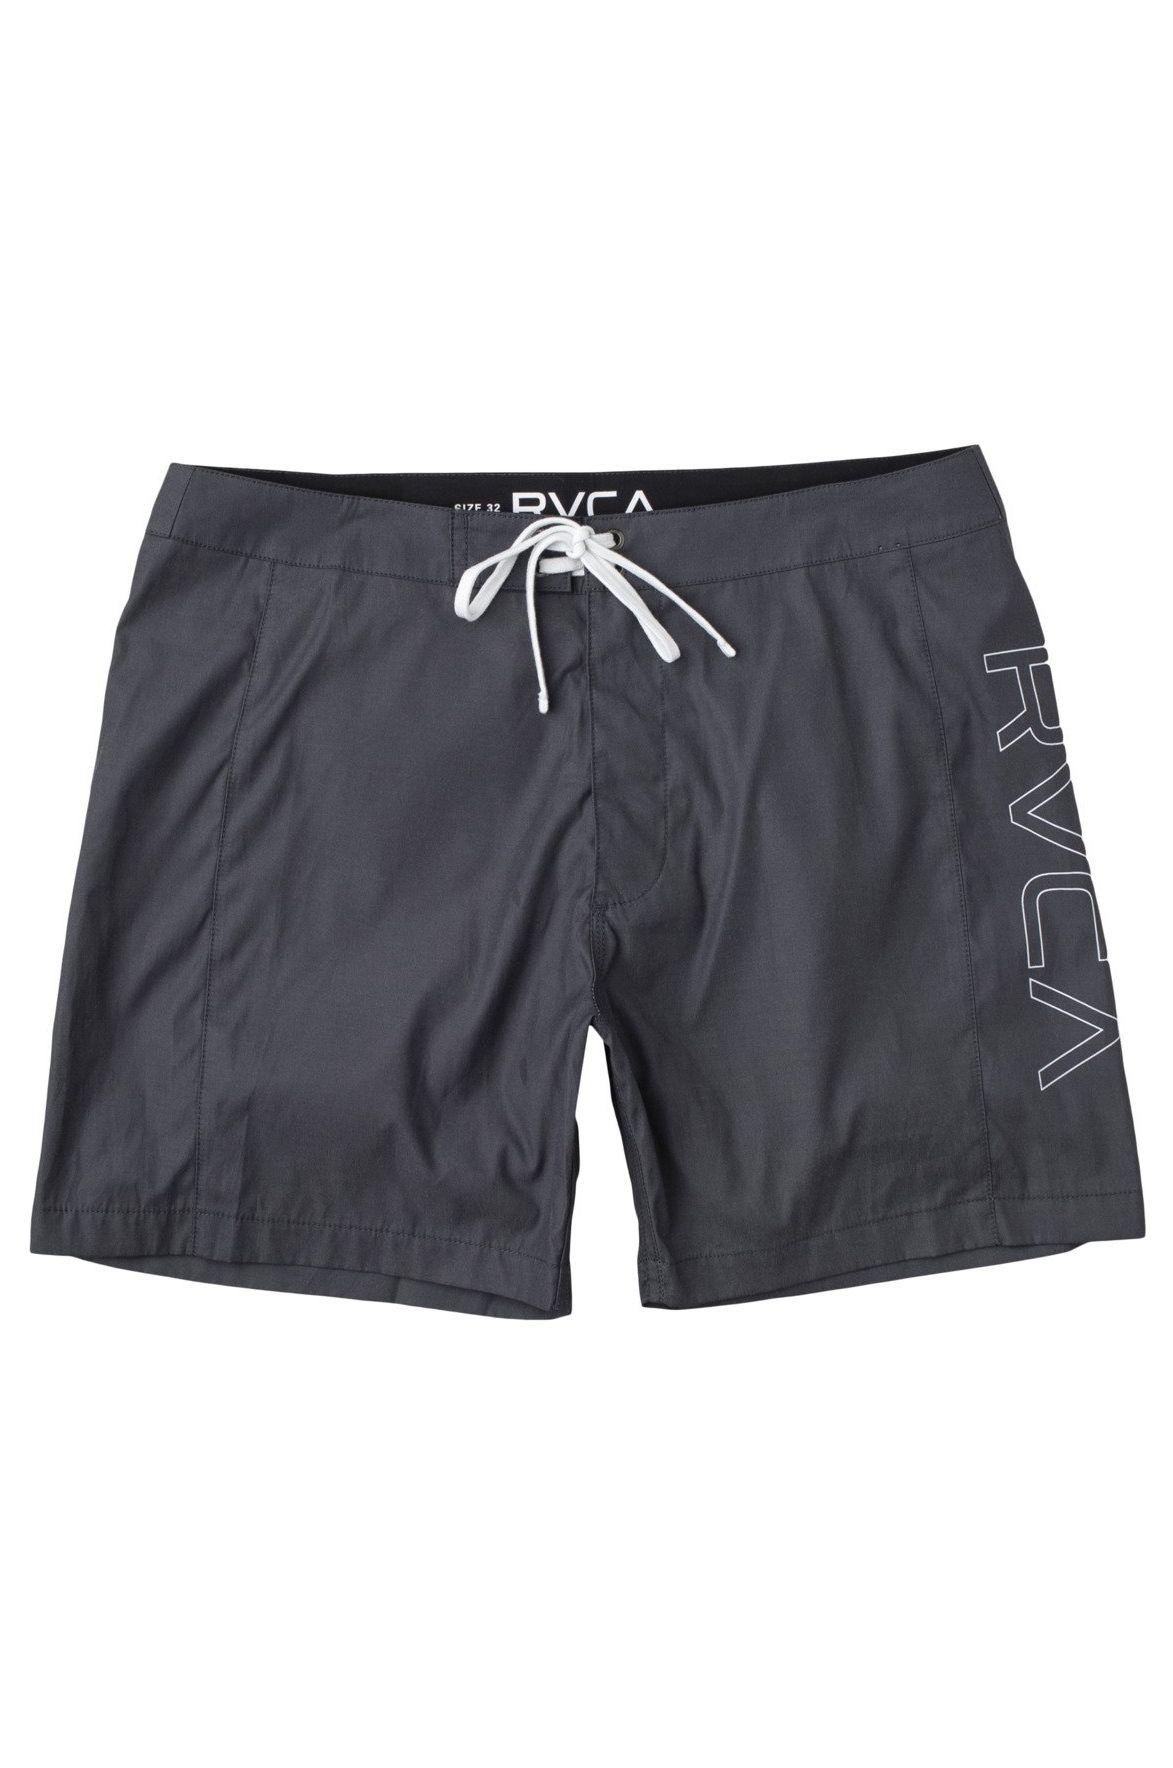 Boardshorts RVCA DULTON TRUNK Black